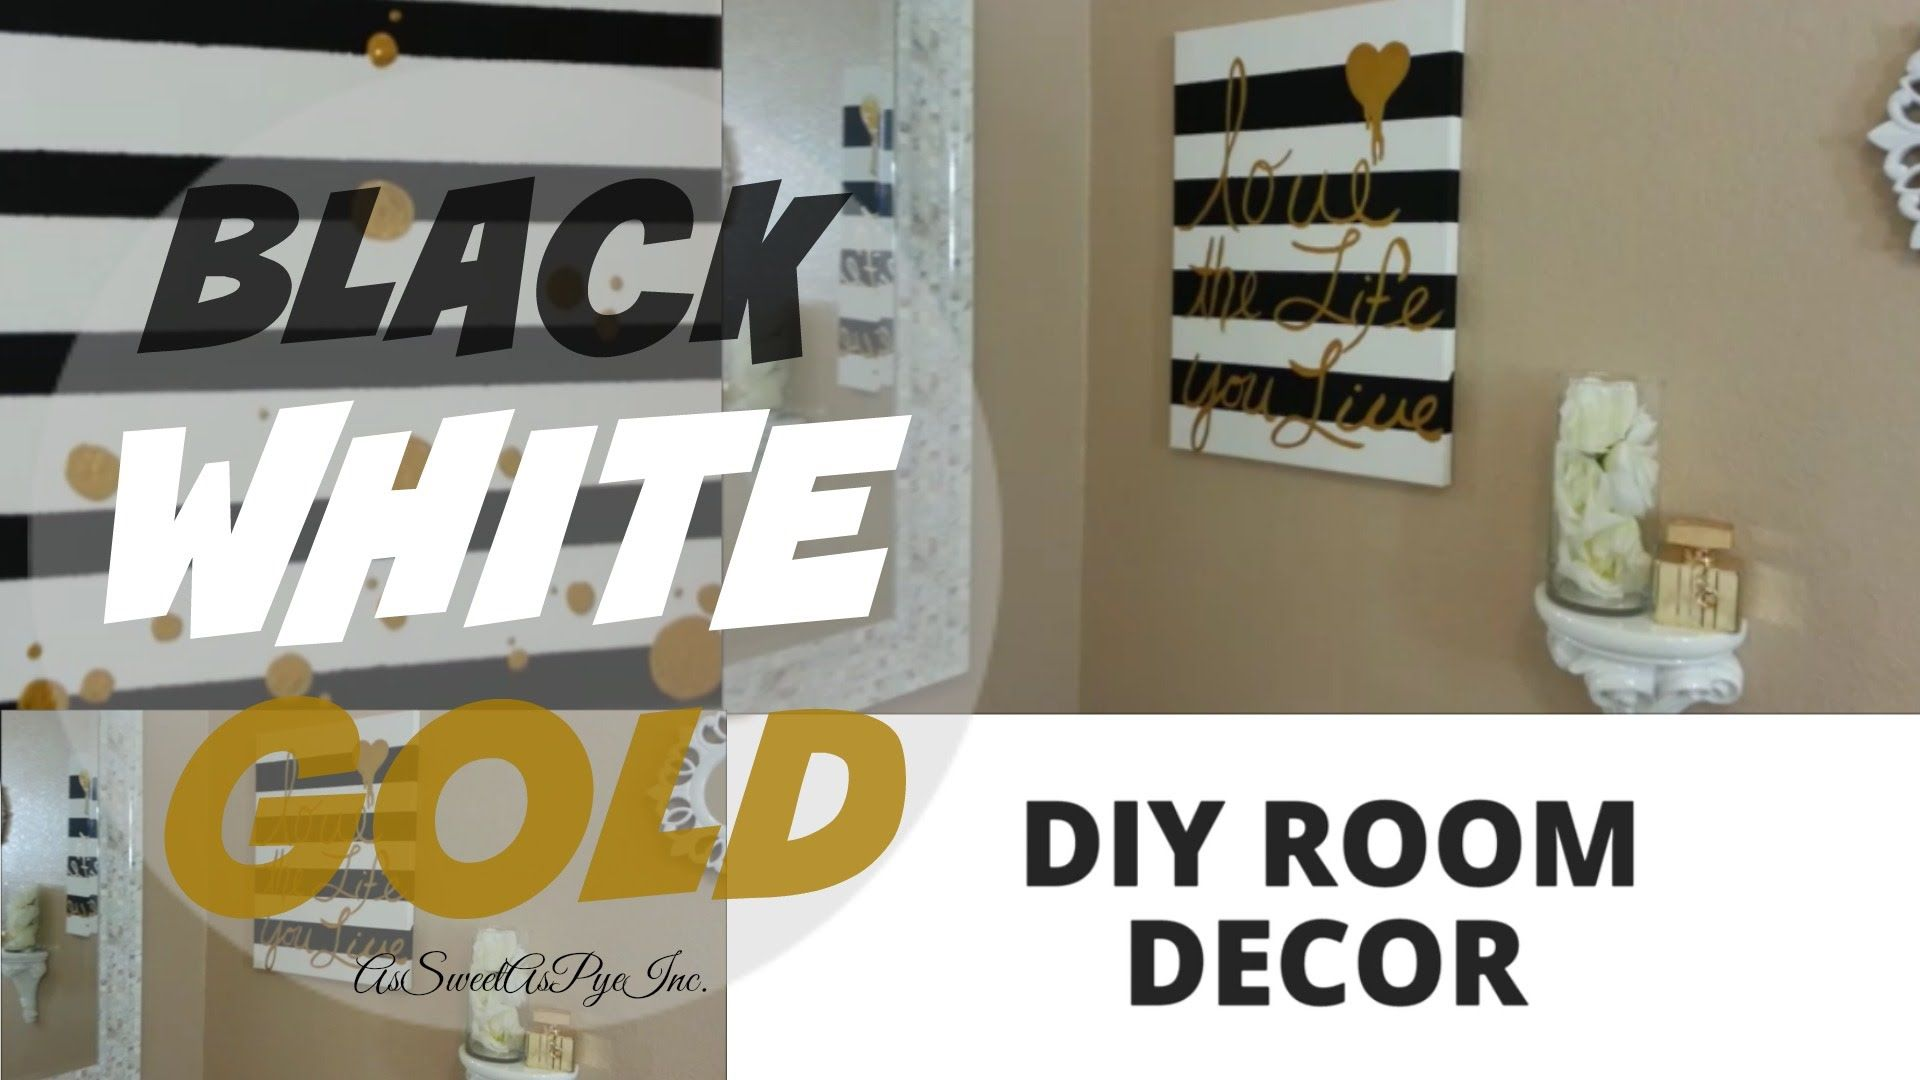 Diy Room Decor Black White Gold Outside Home Improvements